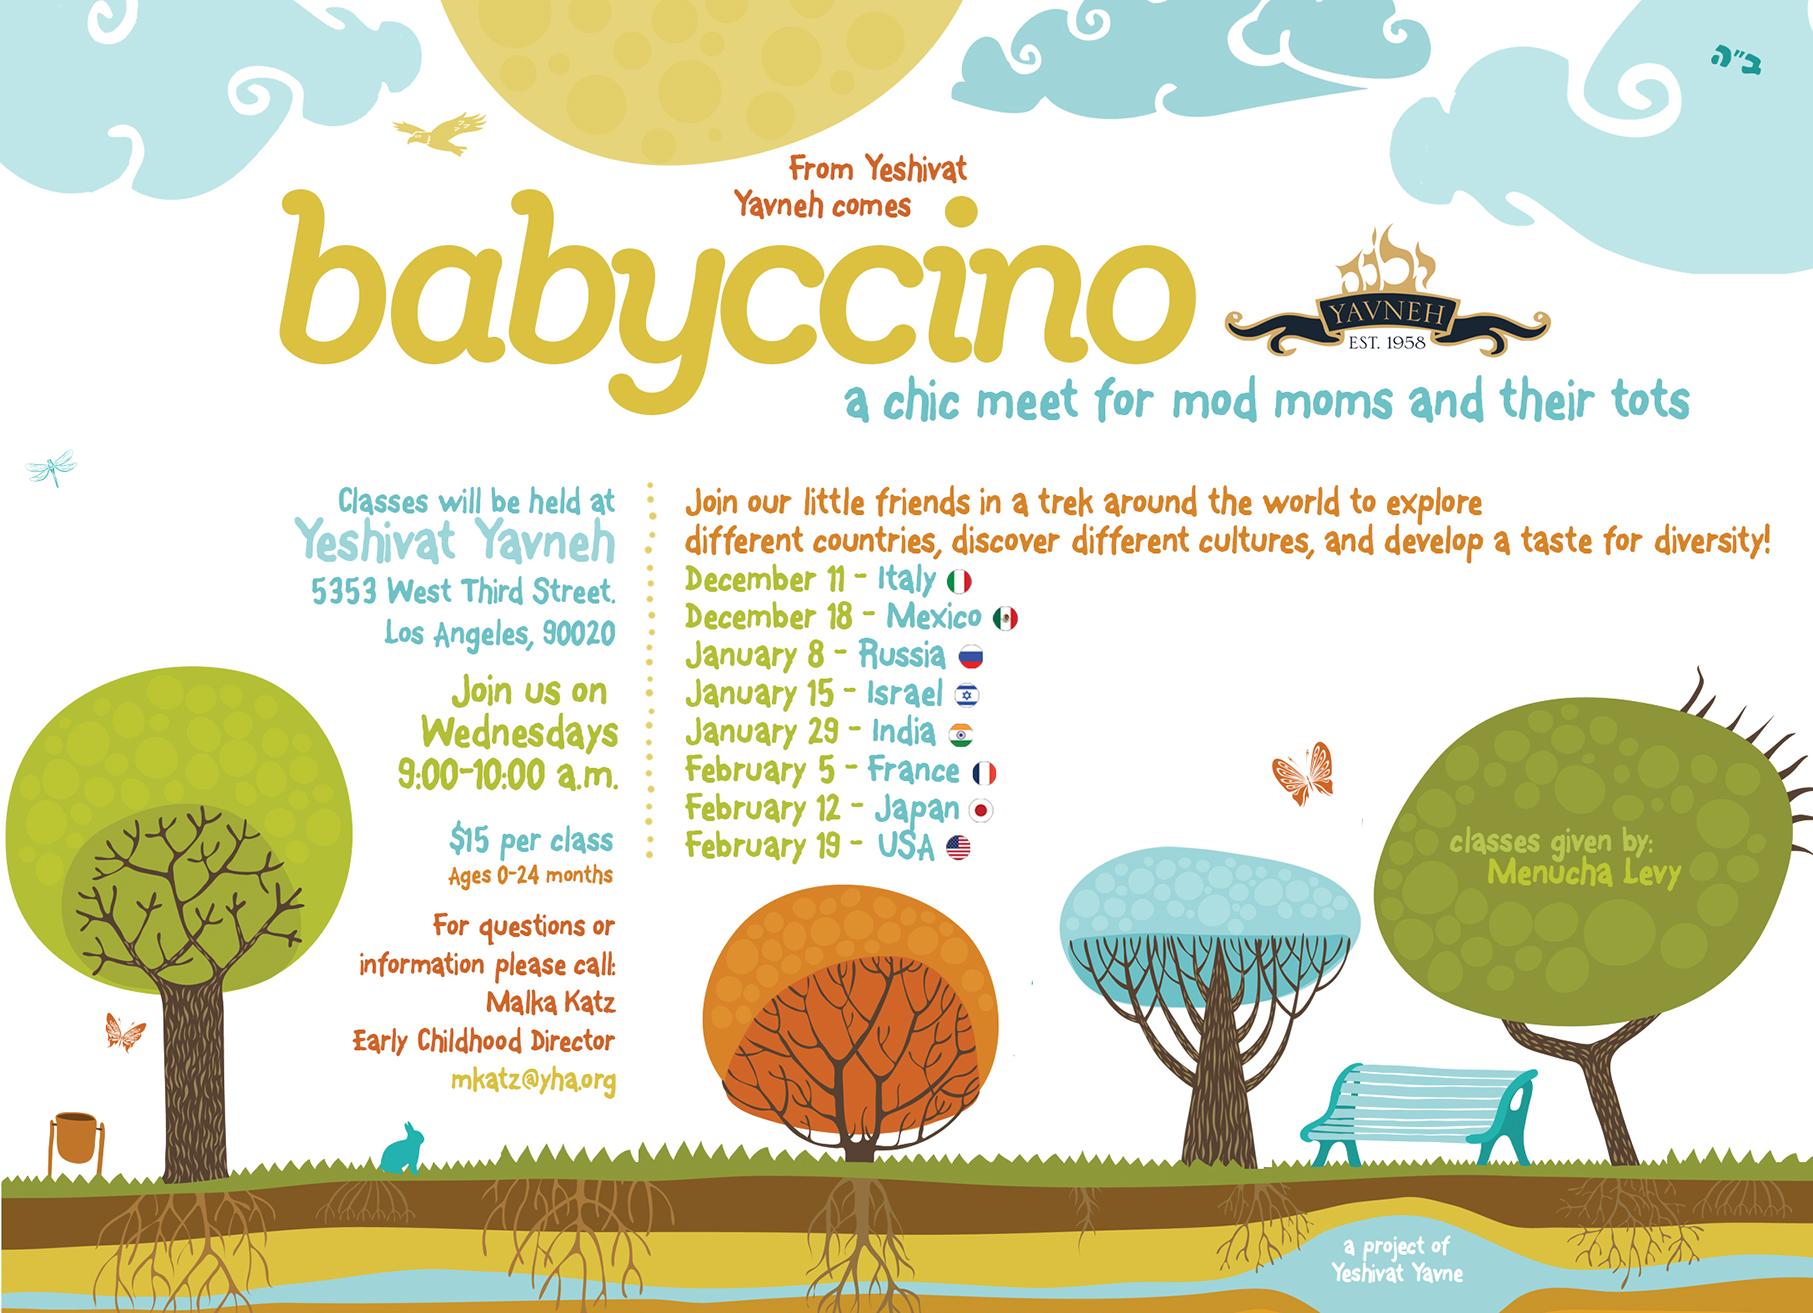 babyccino DIY